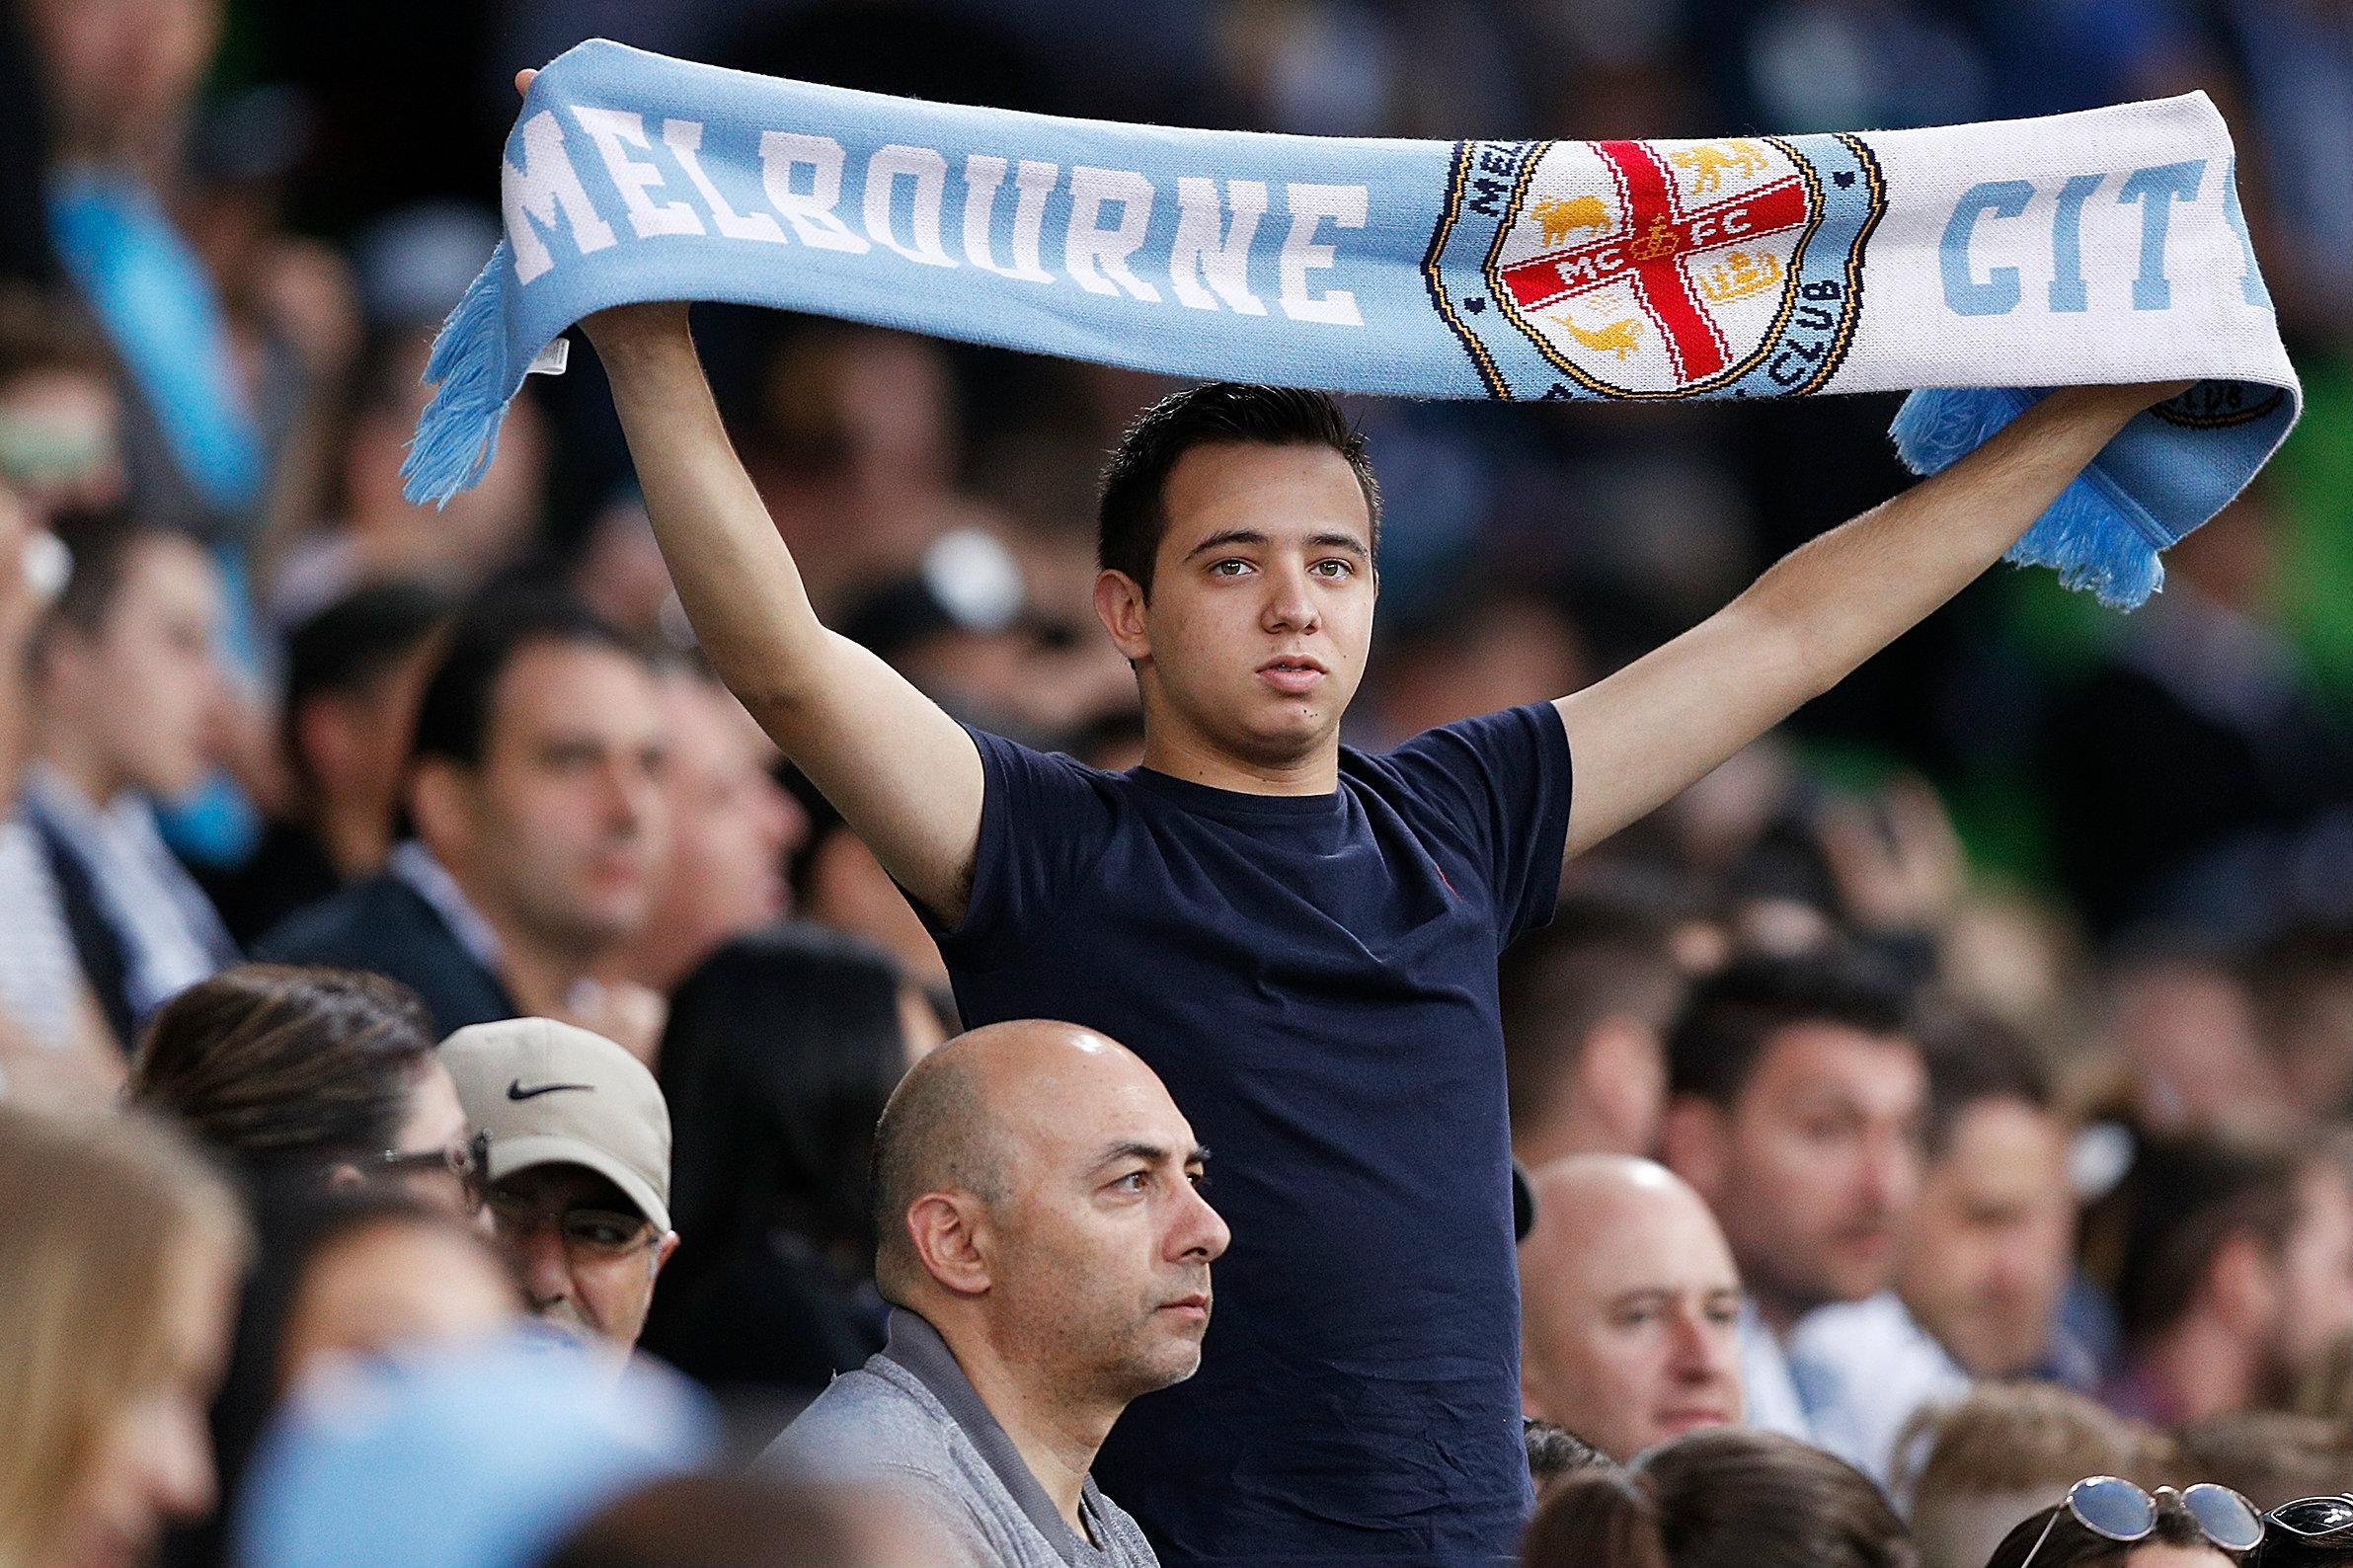 Melbourne City fan